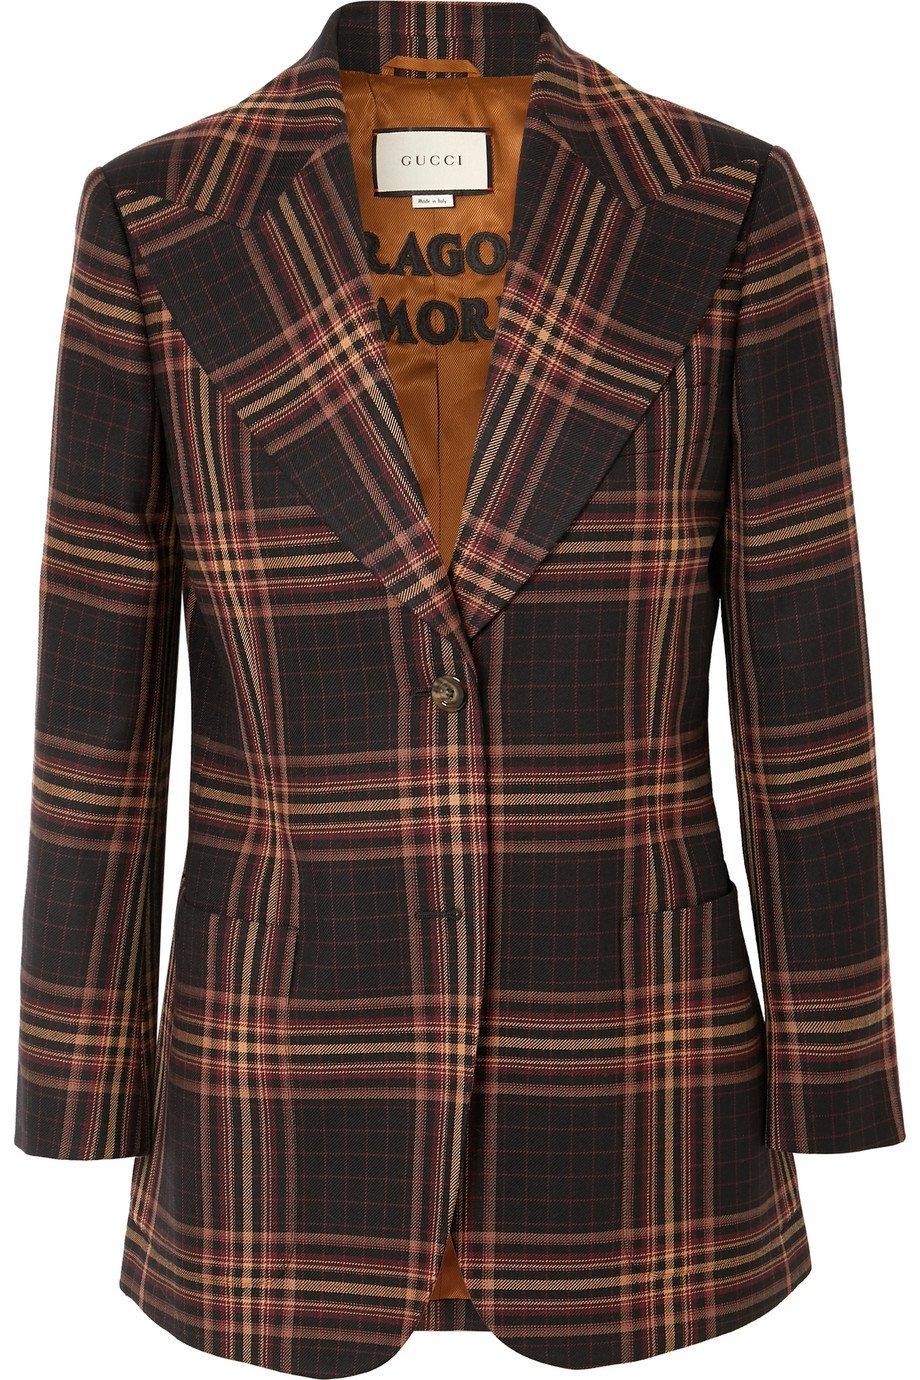 Gucci   Checked wool-twill blazer   NET-A-PORTER.COM